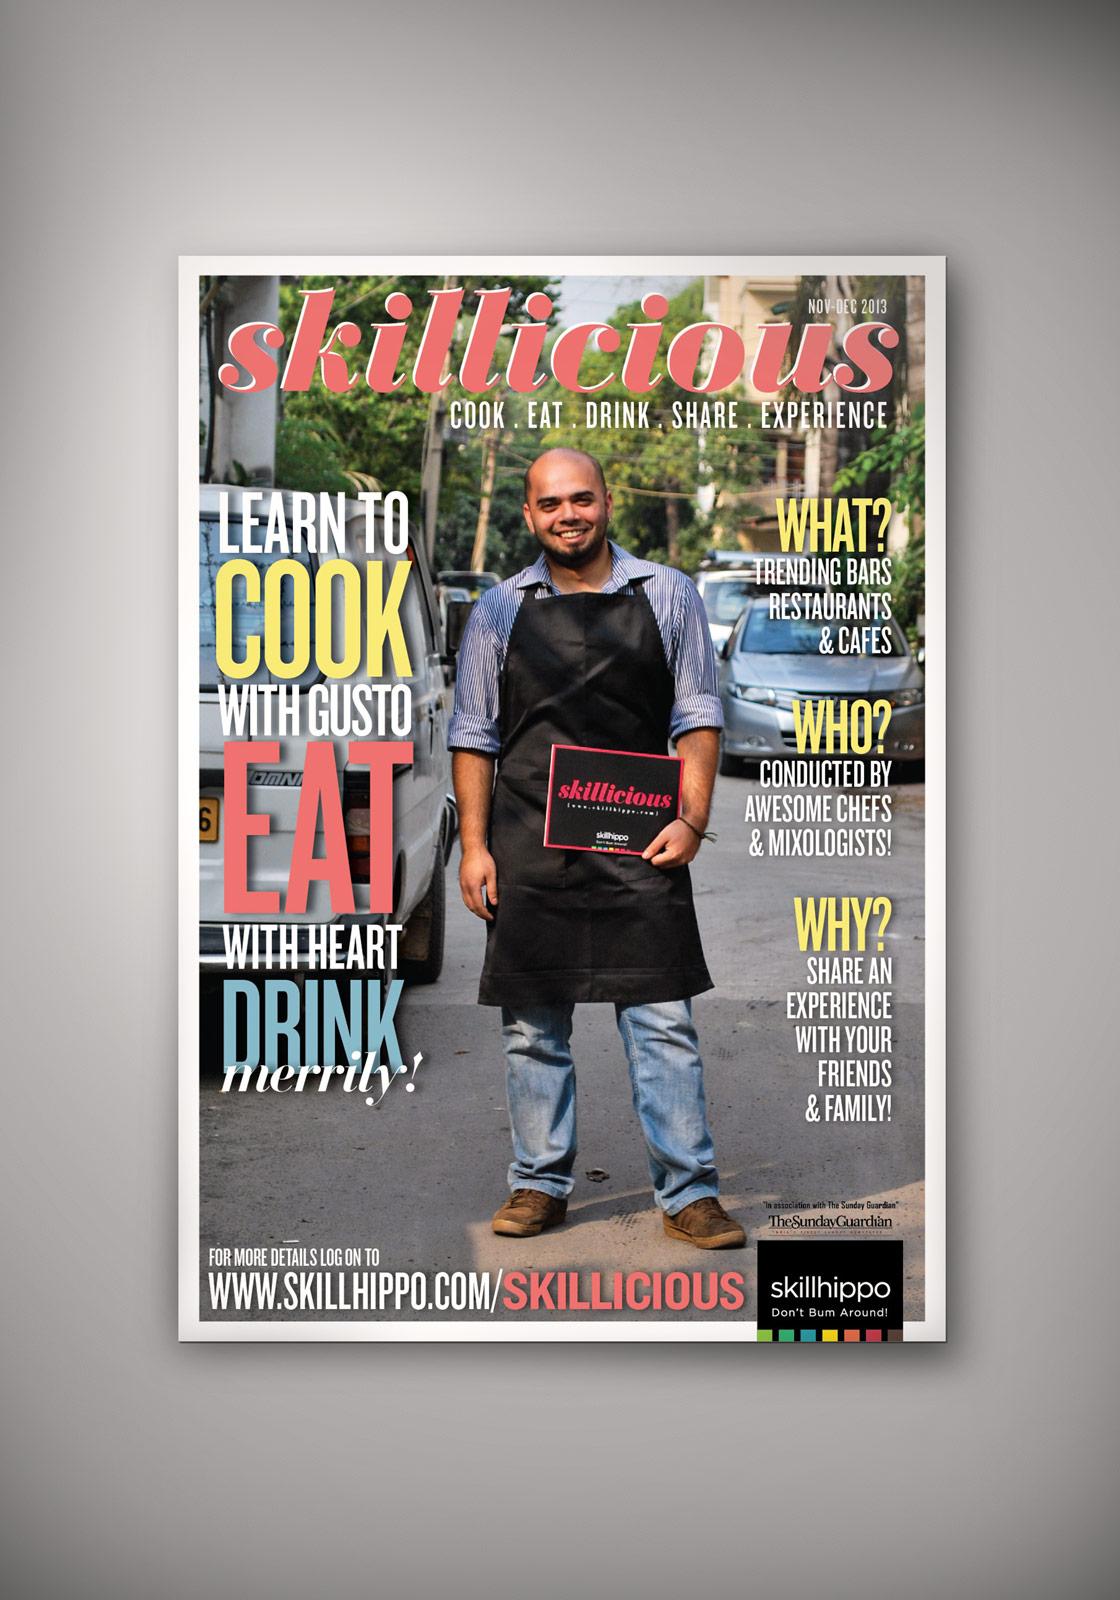 skillicious-poster1